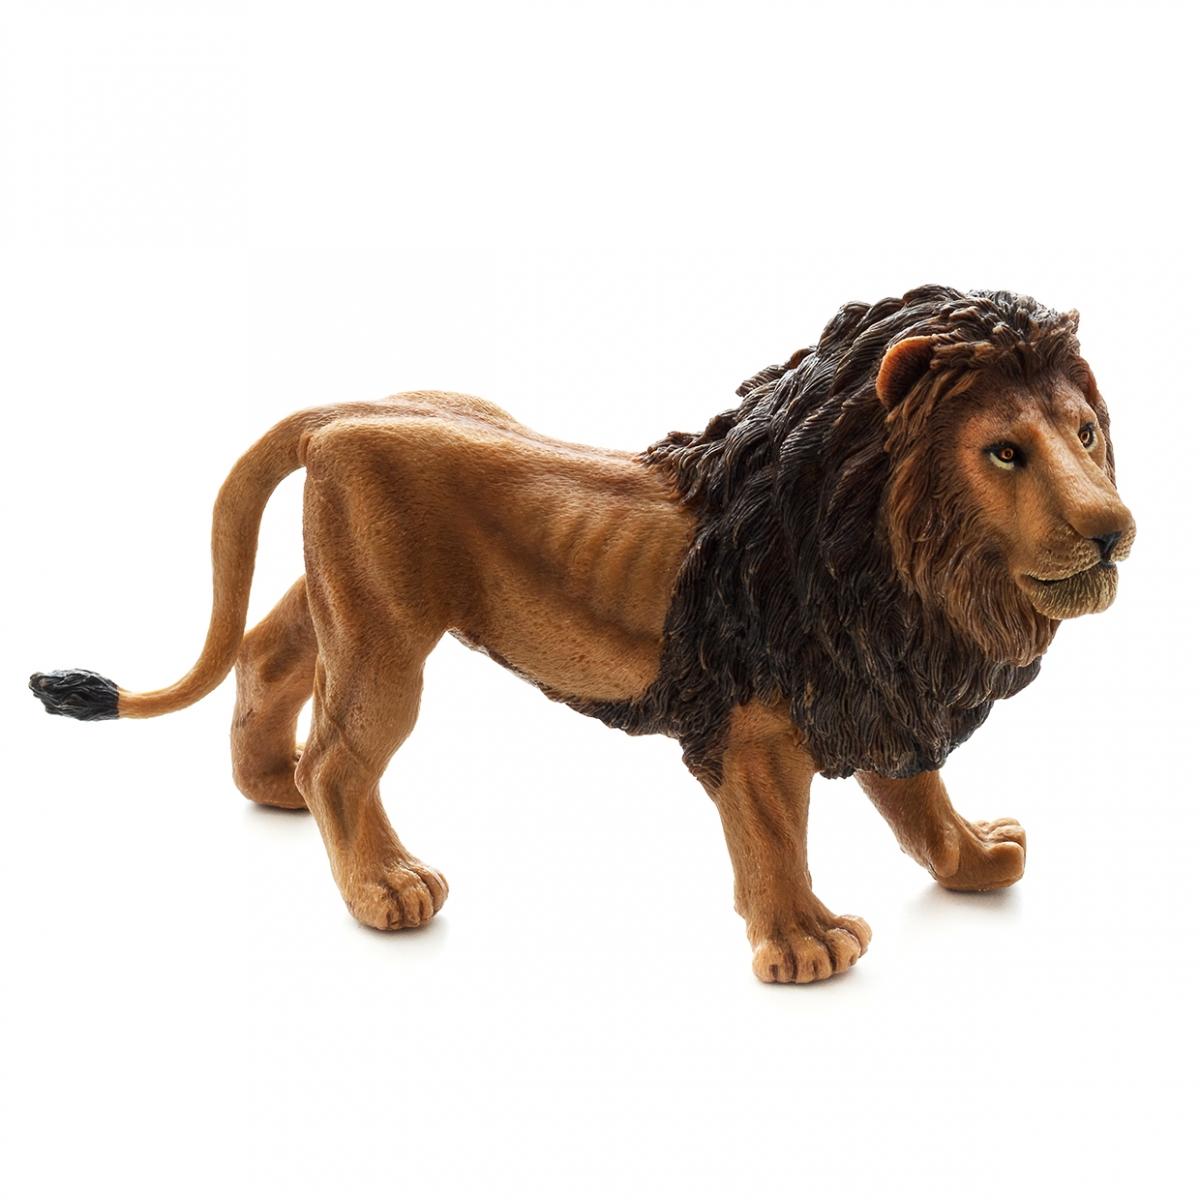 Imagen en la que se ve un león